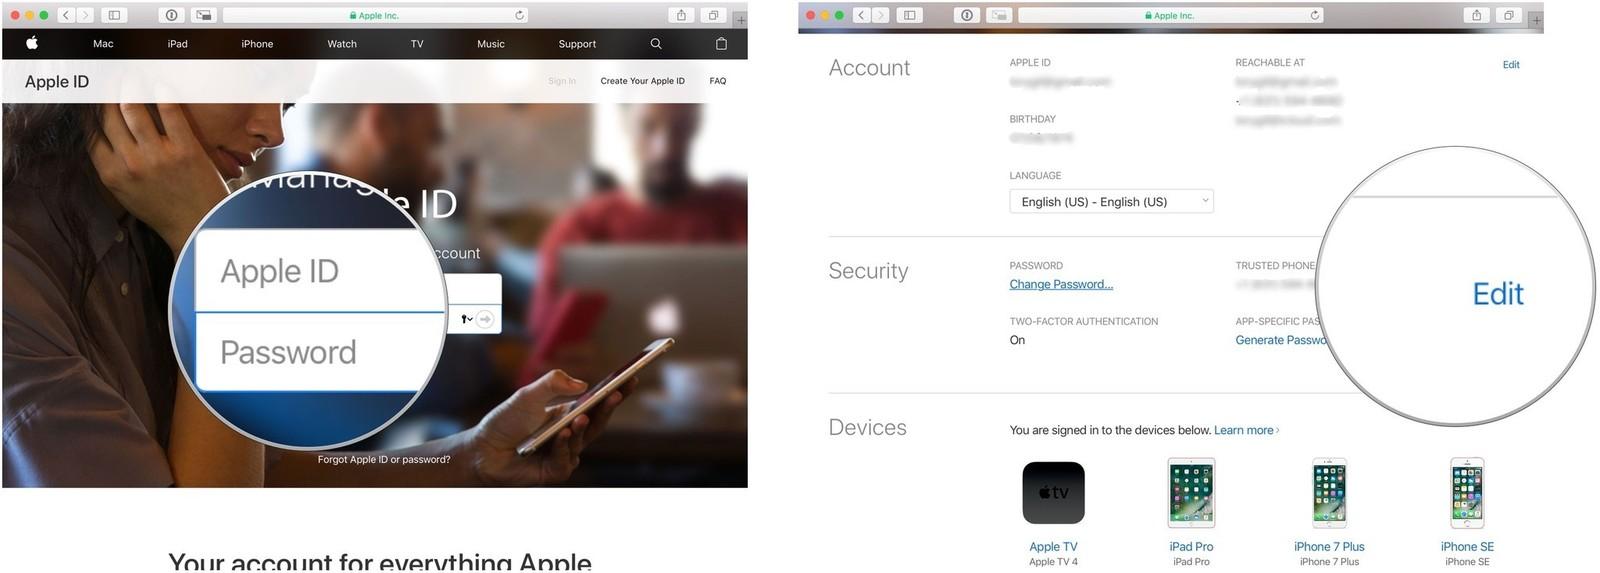 revoke-app-specific-password-01.jpg